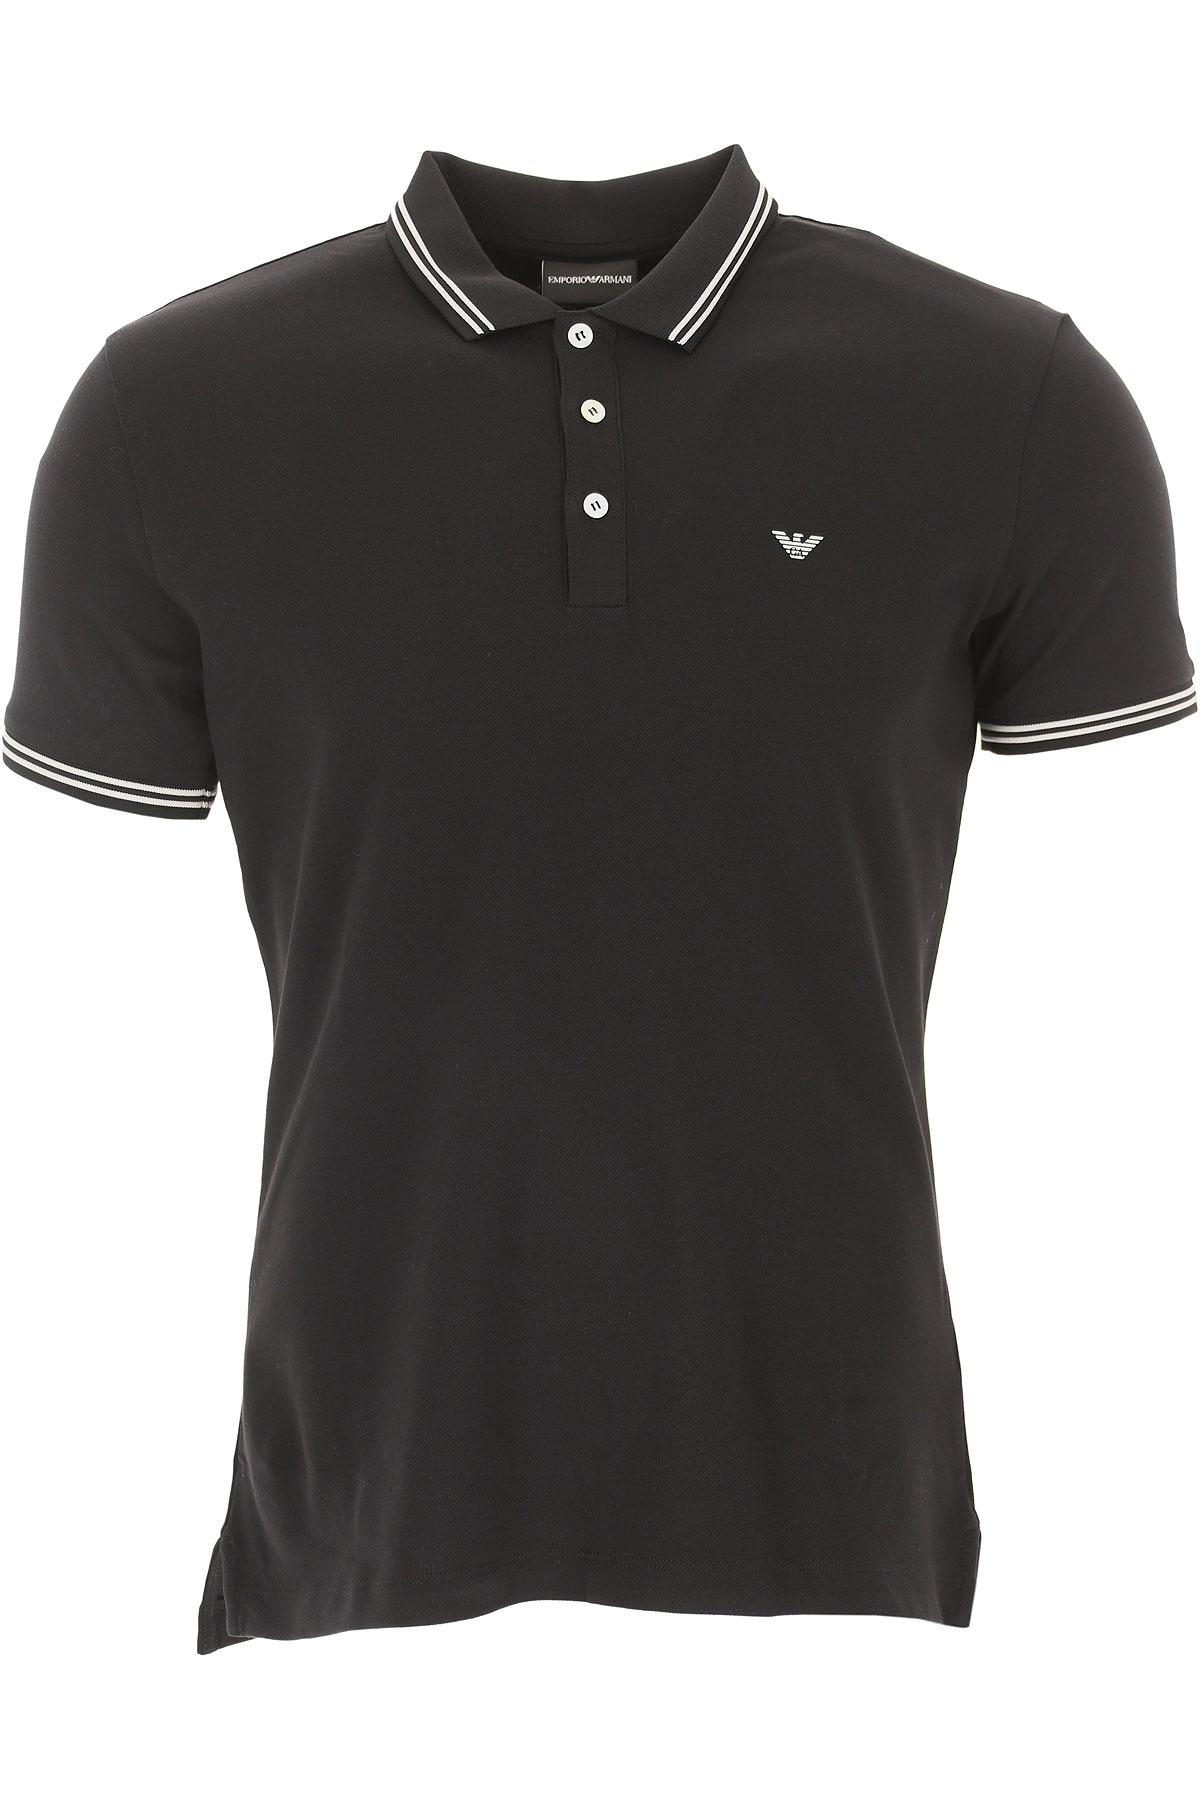 ae61005138 Emporio Armani Polo Μπλουζάκια για Άνδρες Σε Έκπτωση